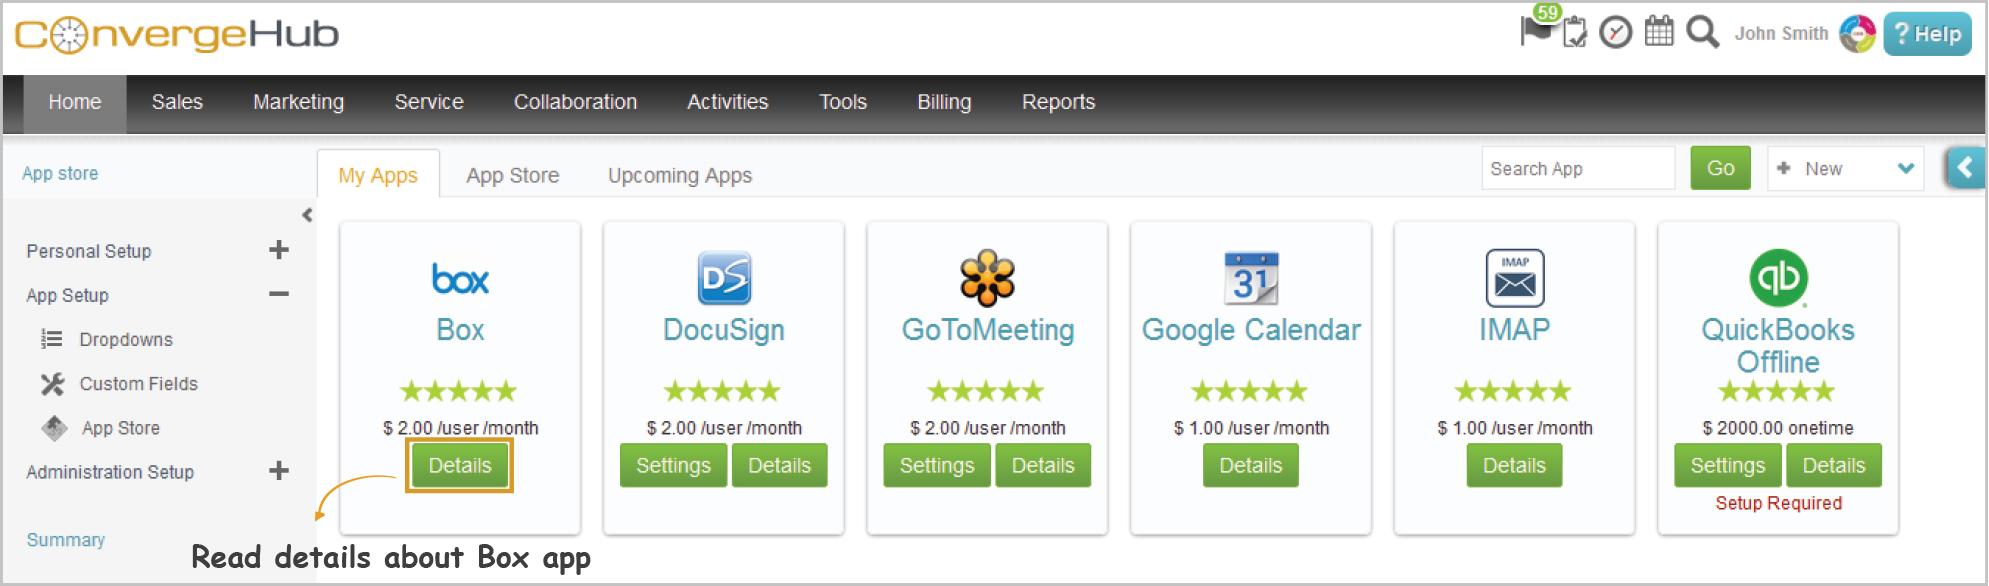 Boxapp in ConvergeHub App Store